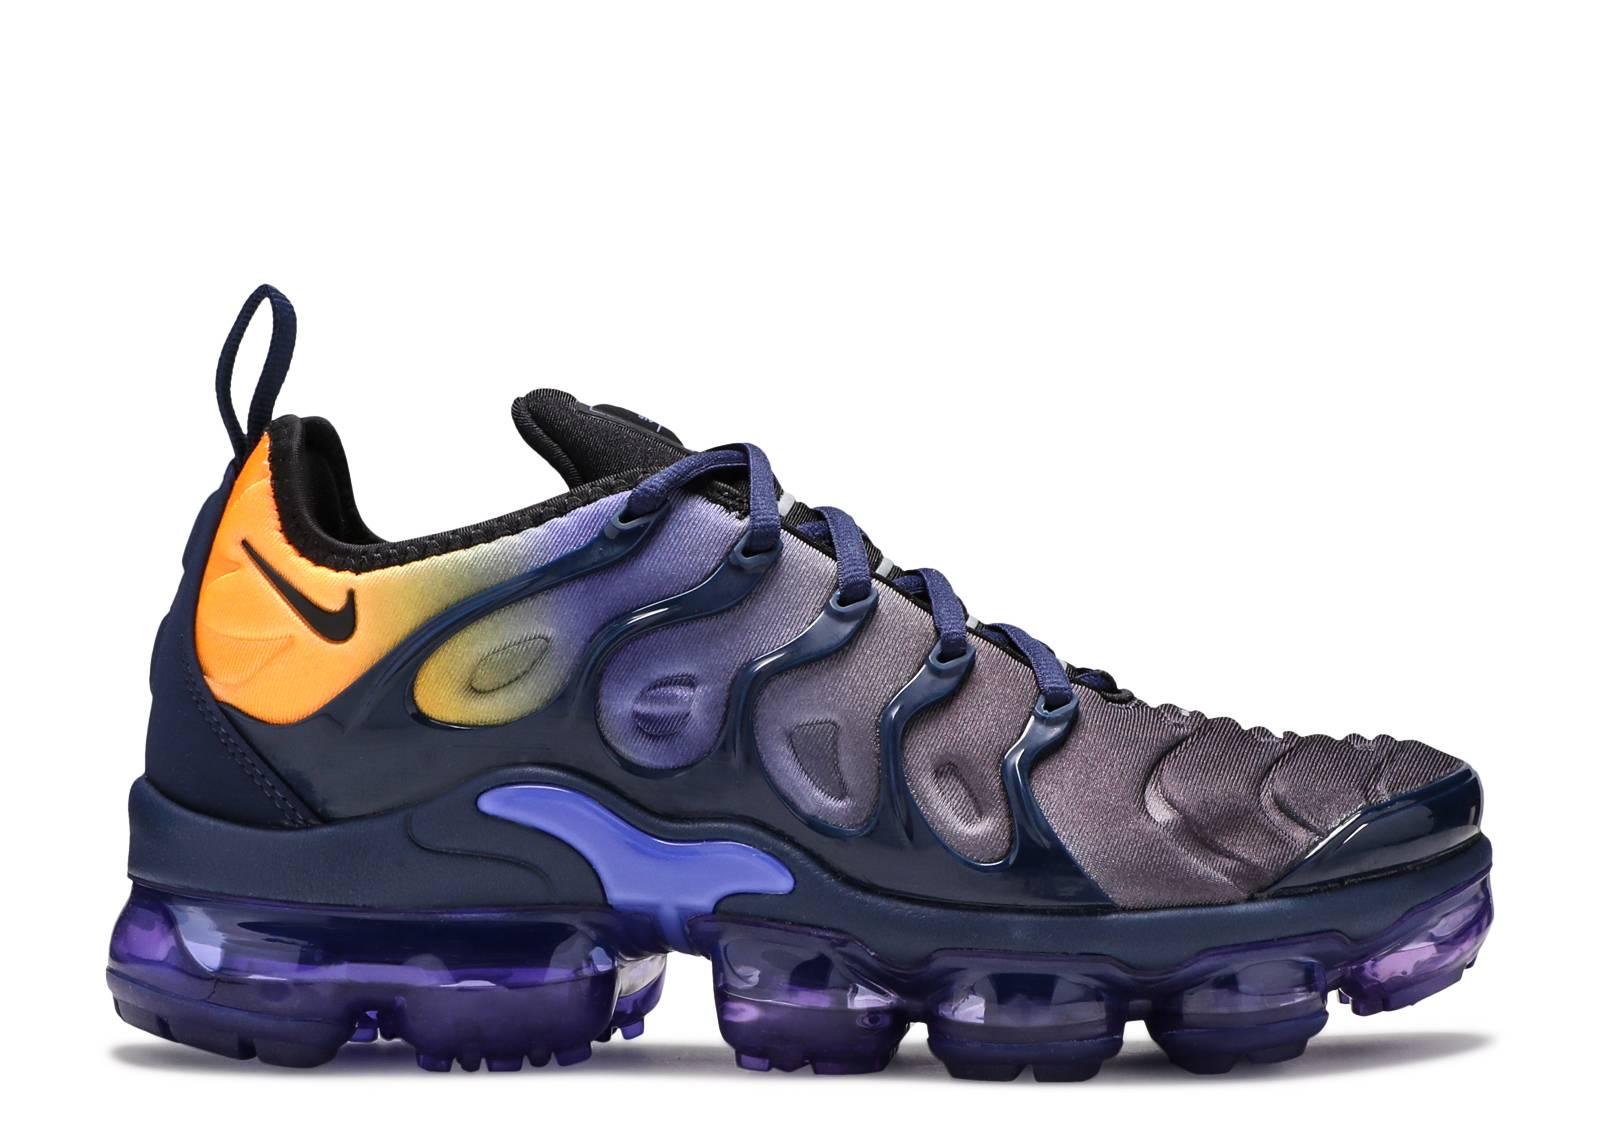 99aeec46de0 Vapormax - Nike Running - Nike